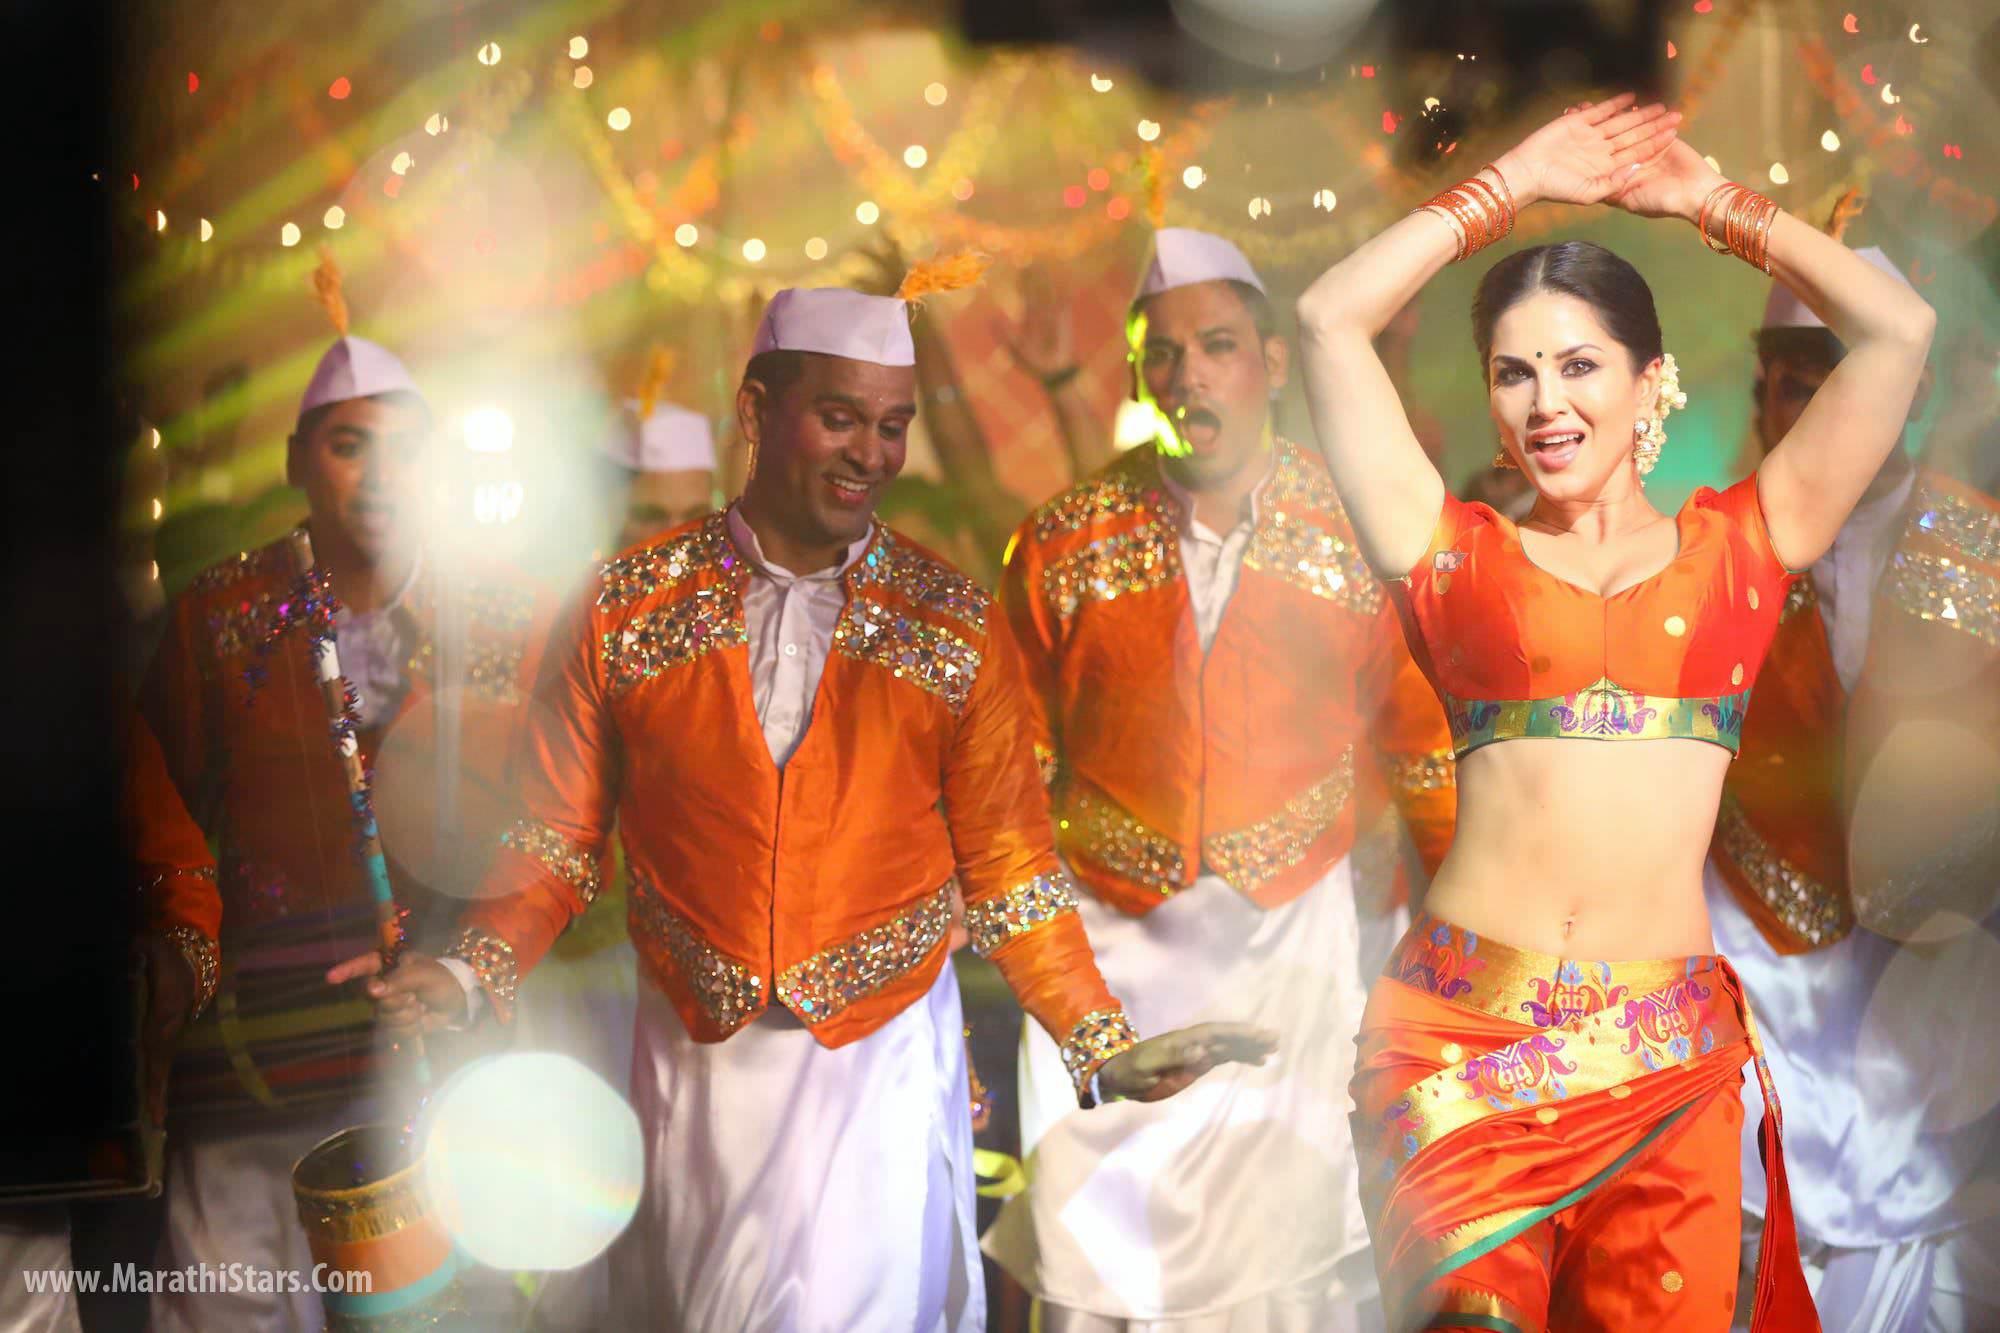 Boyz Marathi Movie Cast Story Trailer Release Date Wiki -3746